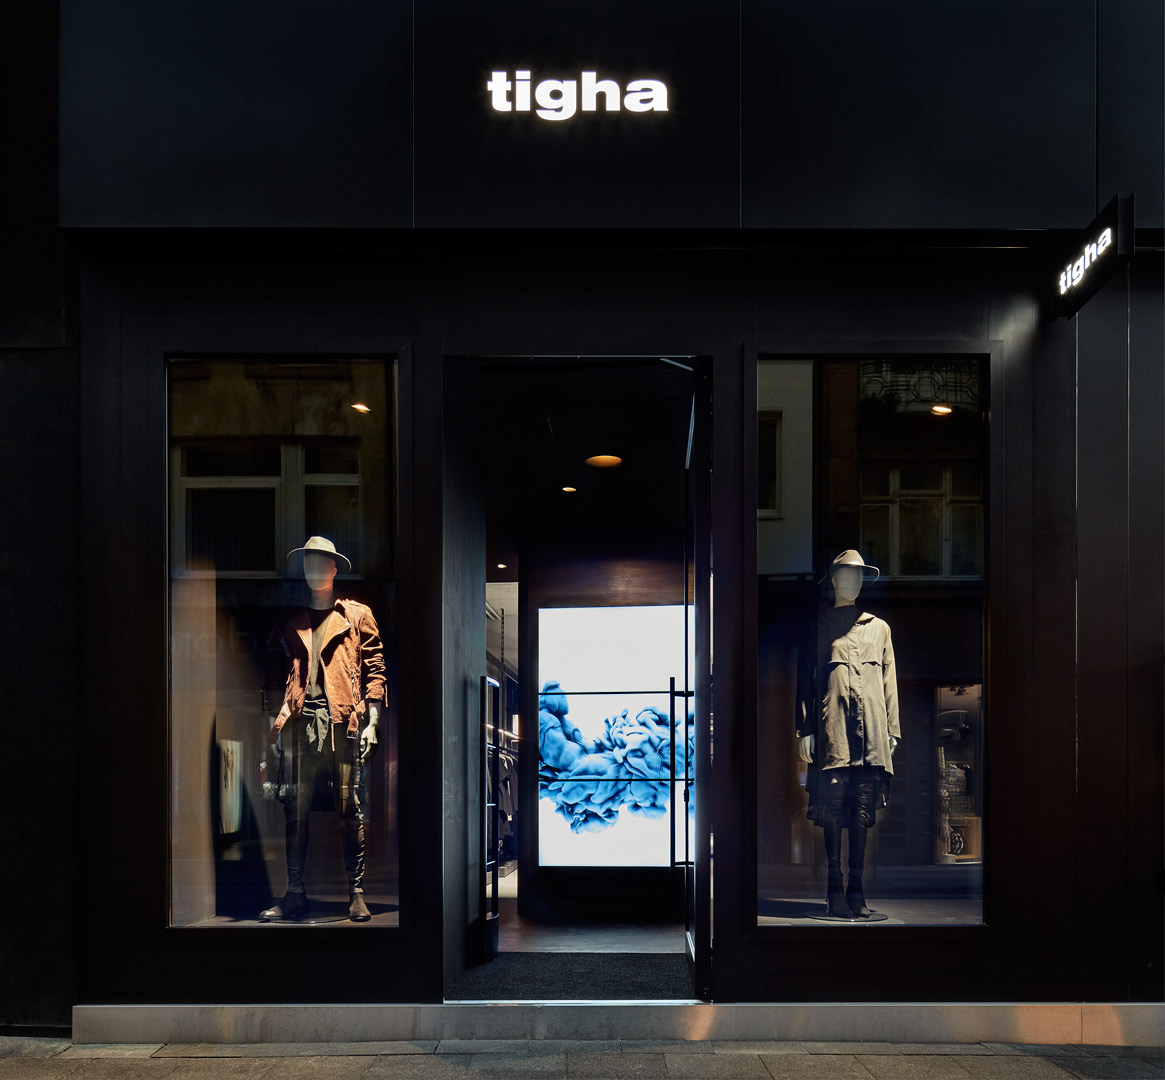 tigha store, Cologne